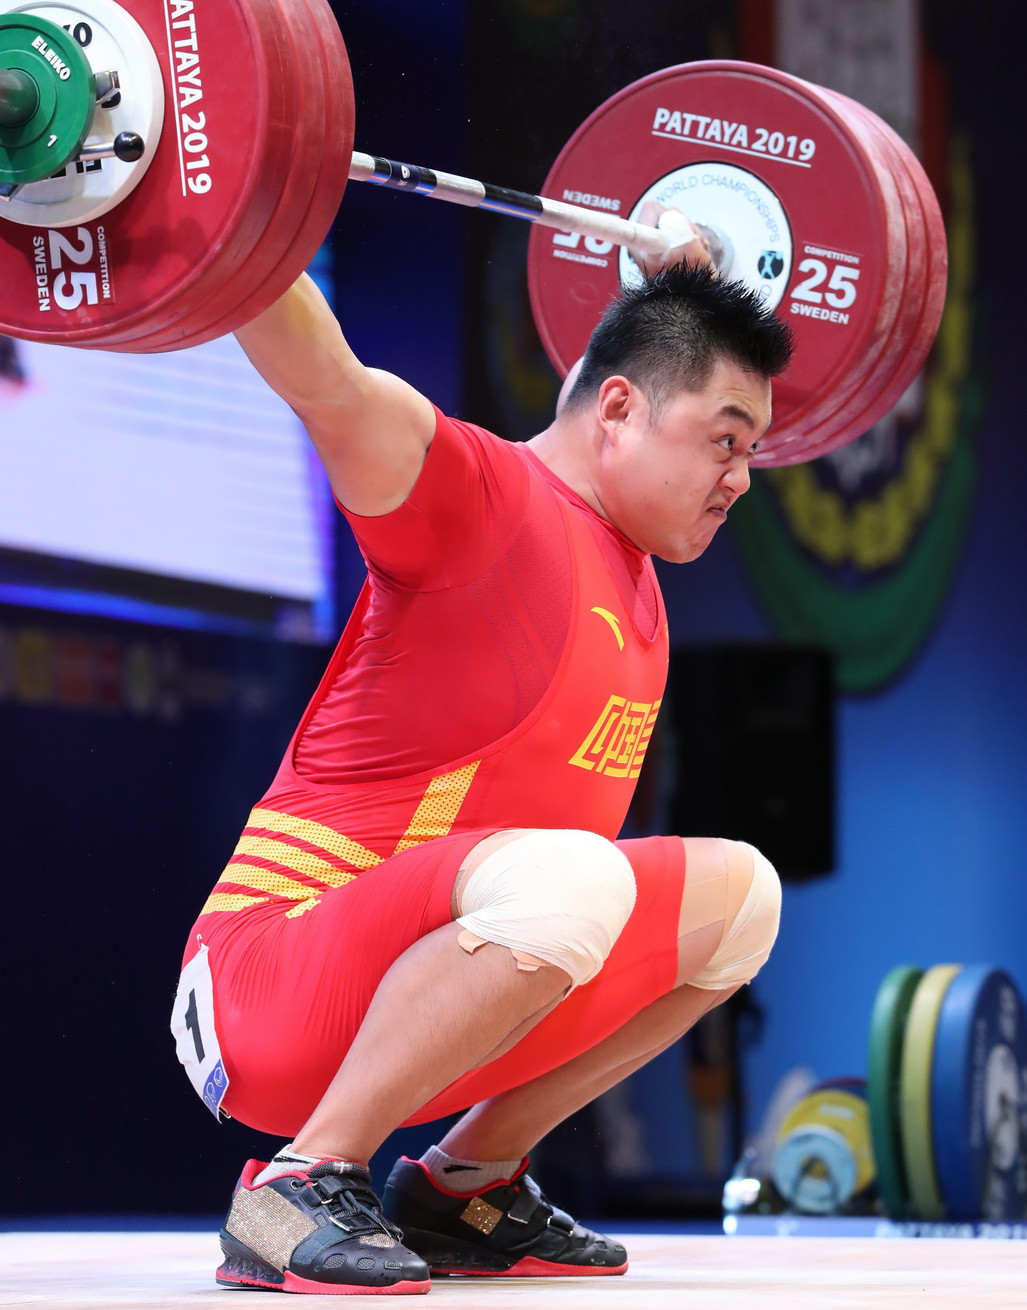 Rounding off the top three was China's Yang Zhe ©IWF